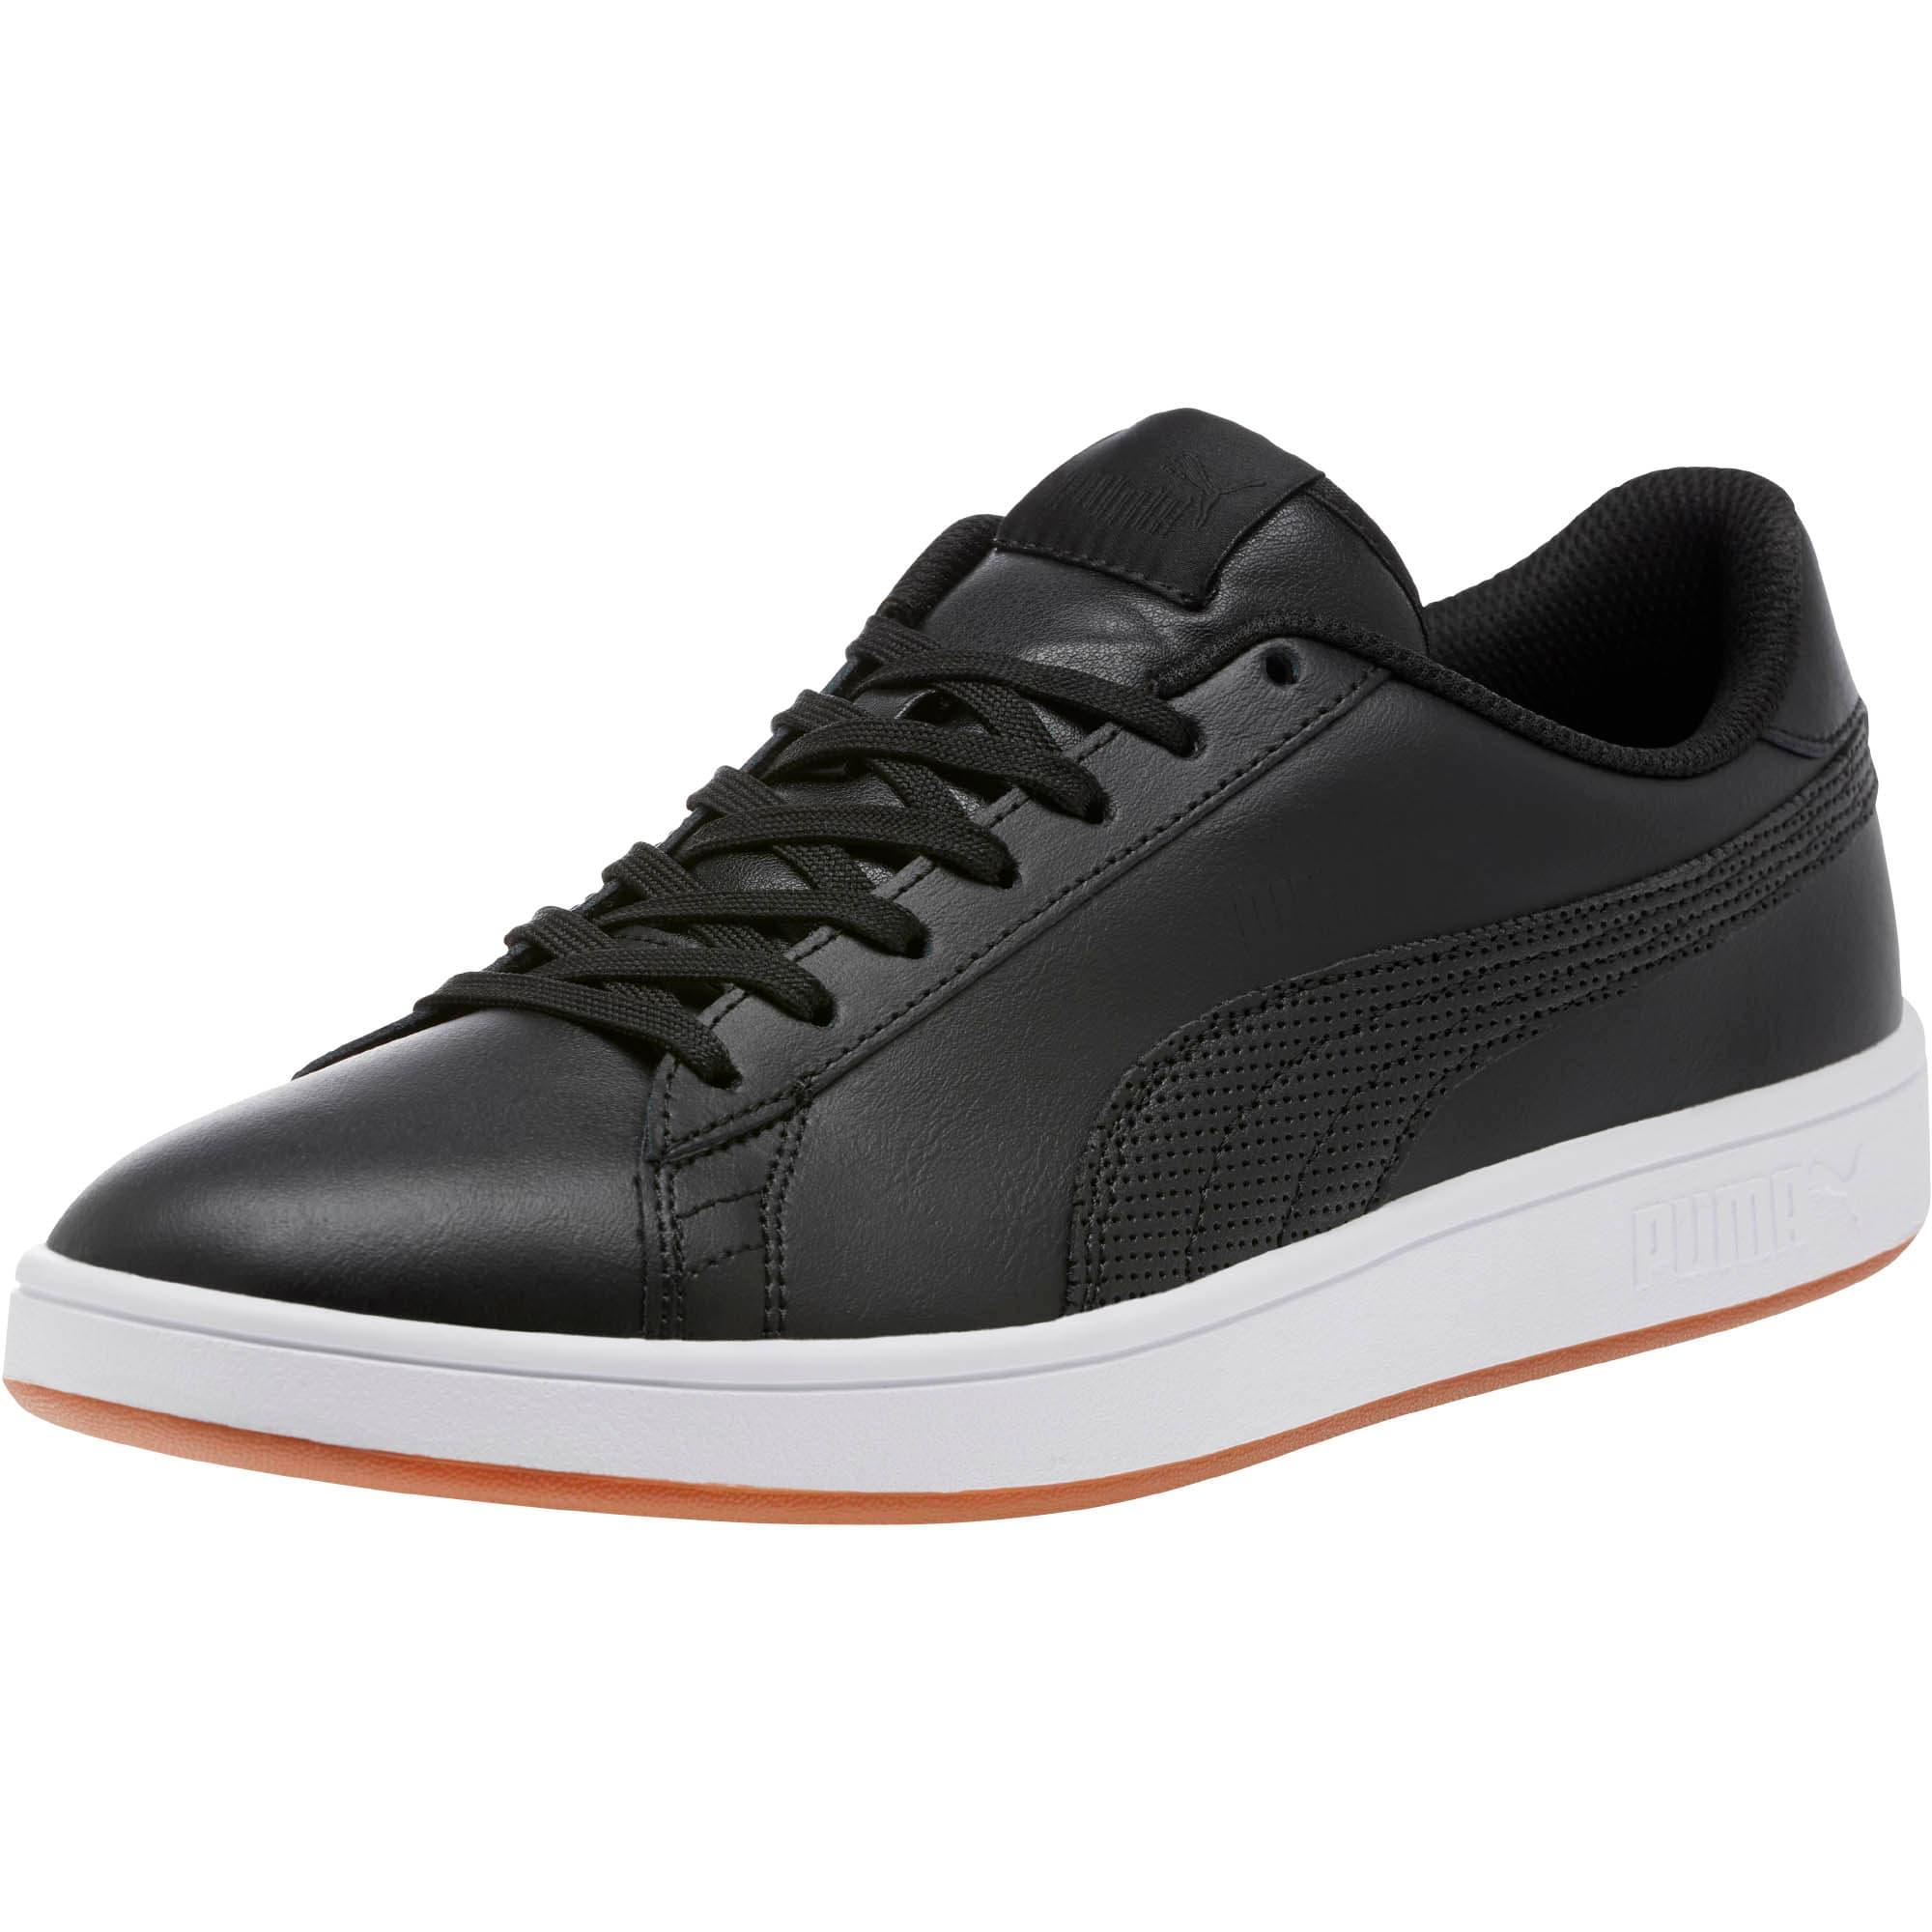 Smash V2 Leather Men's Sneakers